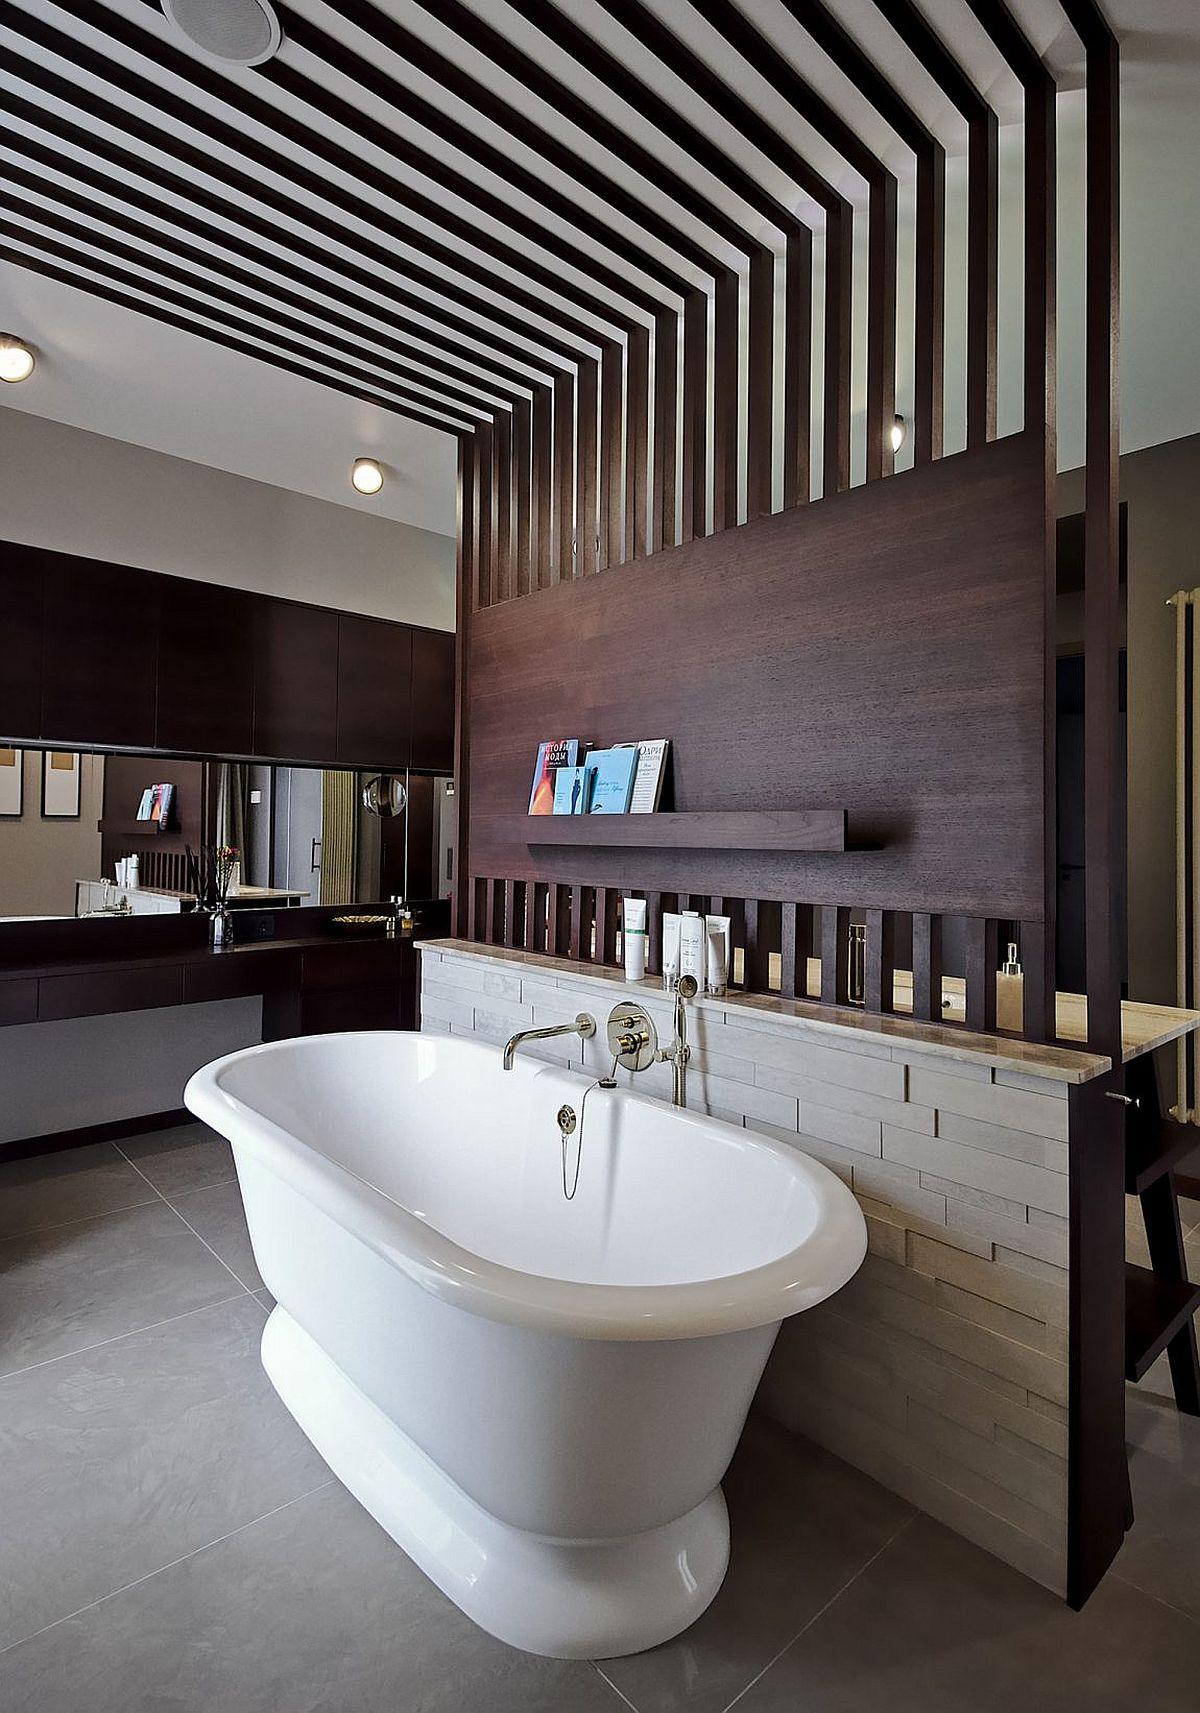 Freestanding bathtub in white